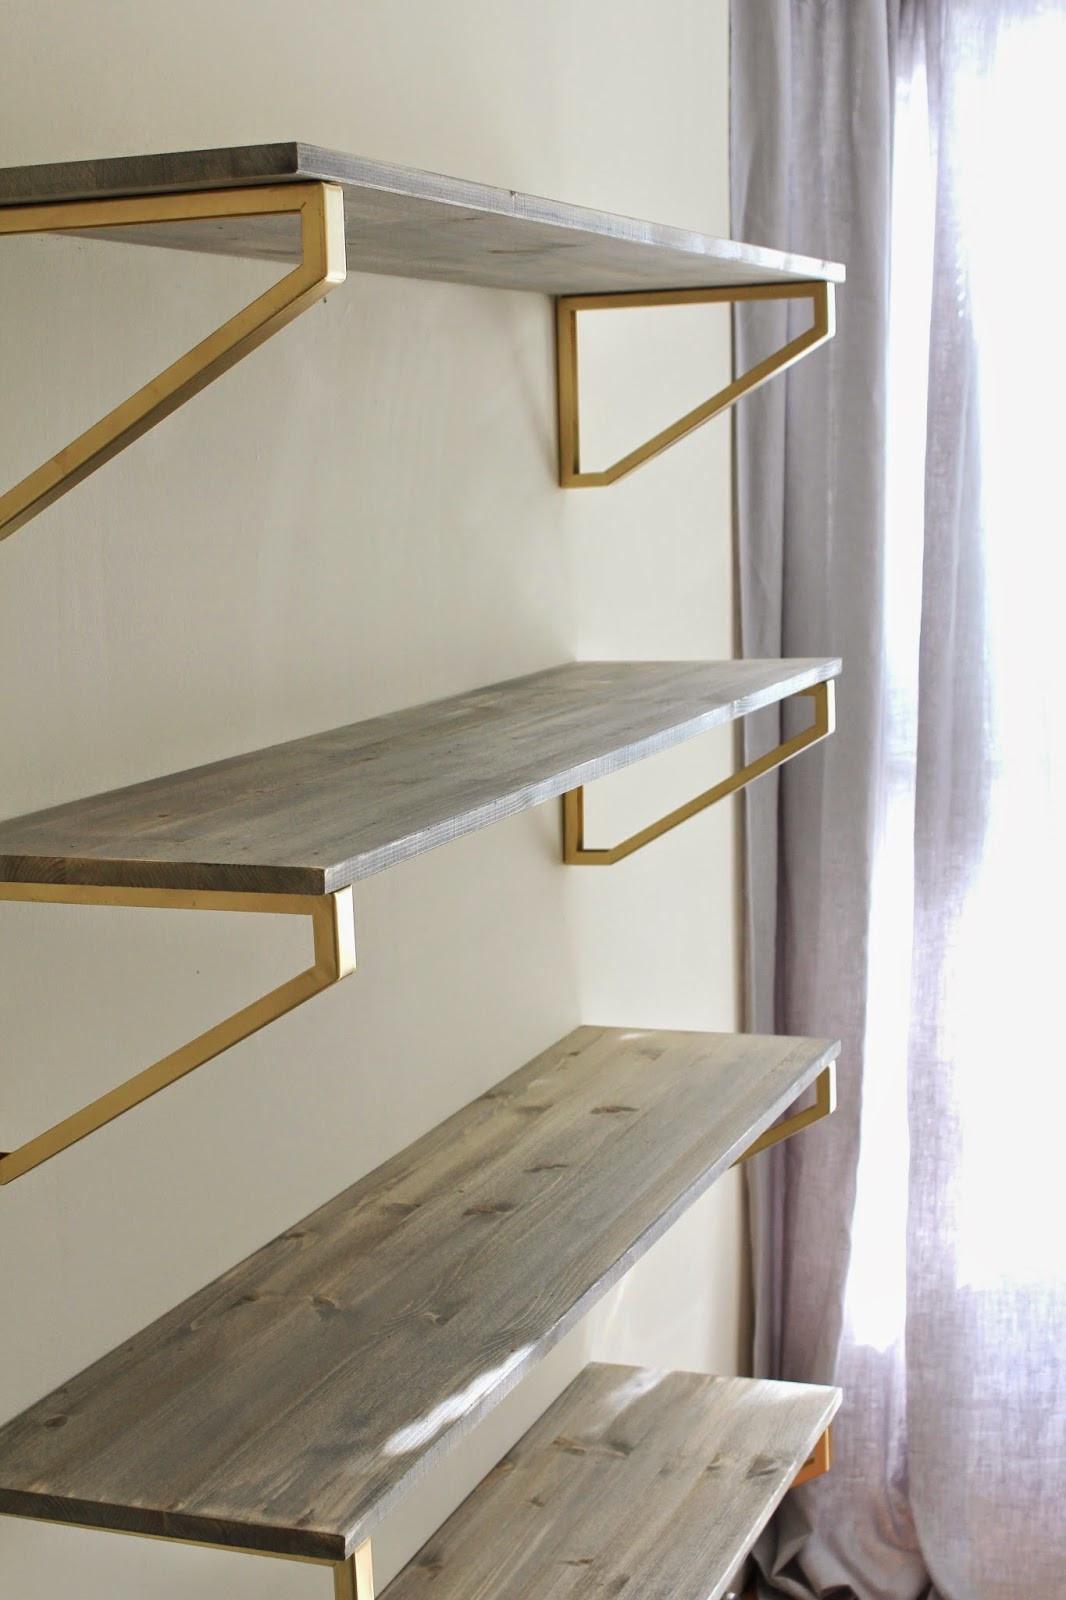 Best ideas about DIY Shelf Bracket . Save or Pin Cup Half Full Rustic Wood Shelf DIY Now.